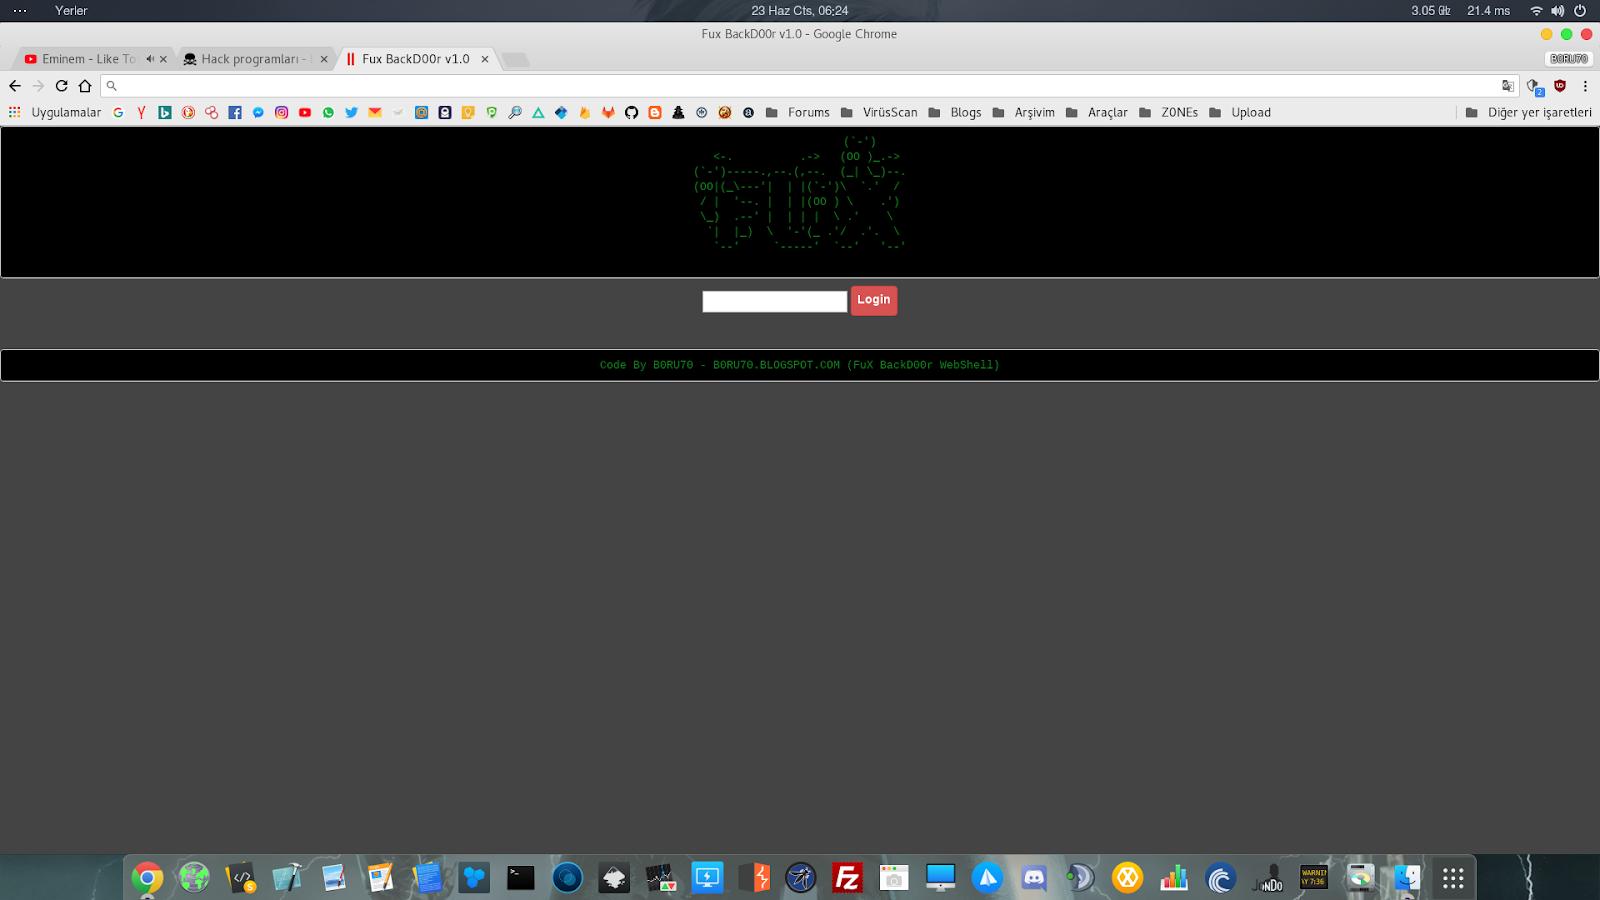 FuX WebShell (fux php)   Under World   Exploit   W@rez